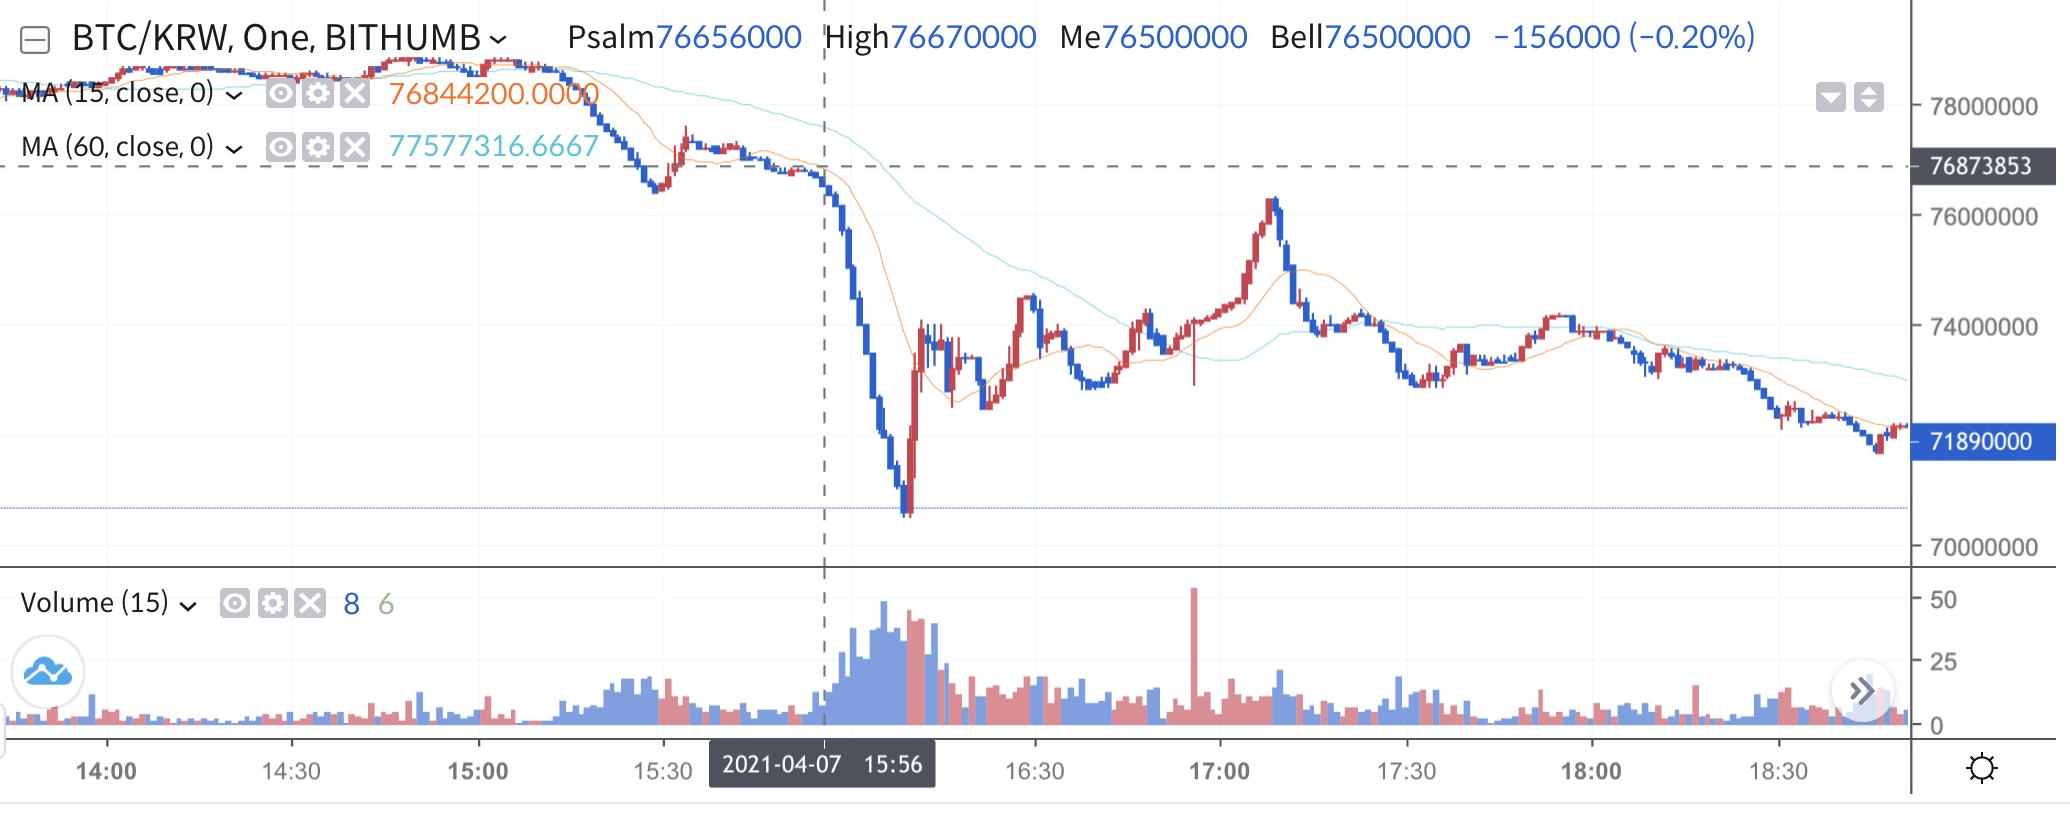 Bitcoin's KRW price on Bithumb, April 2021